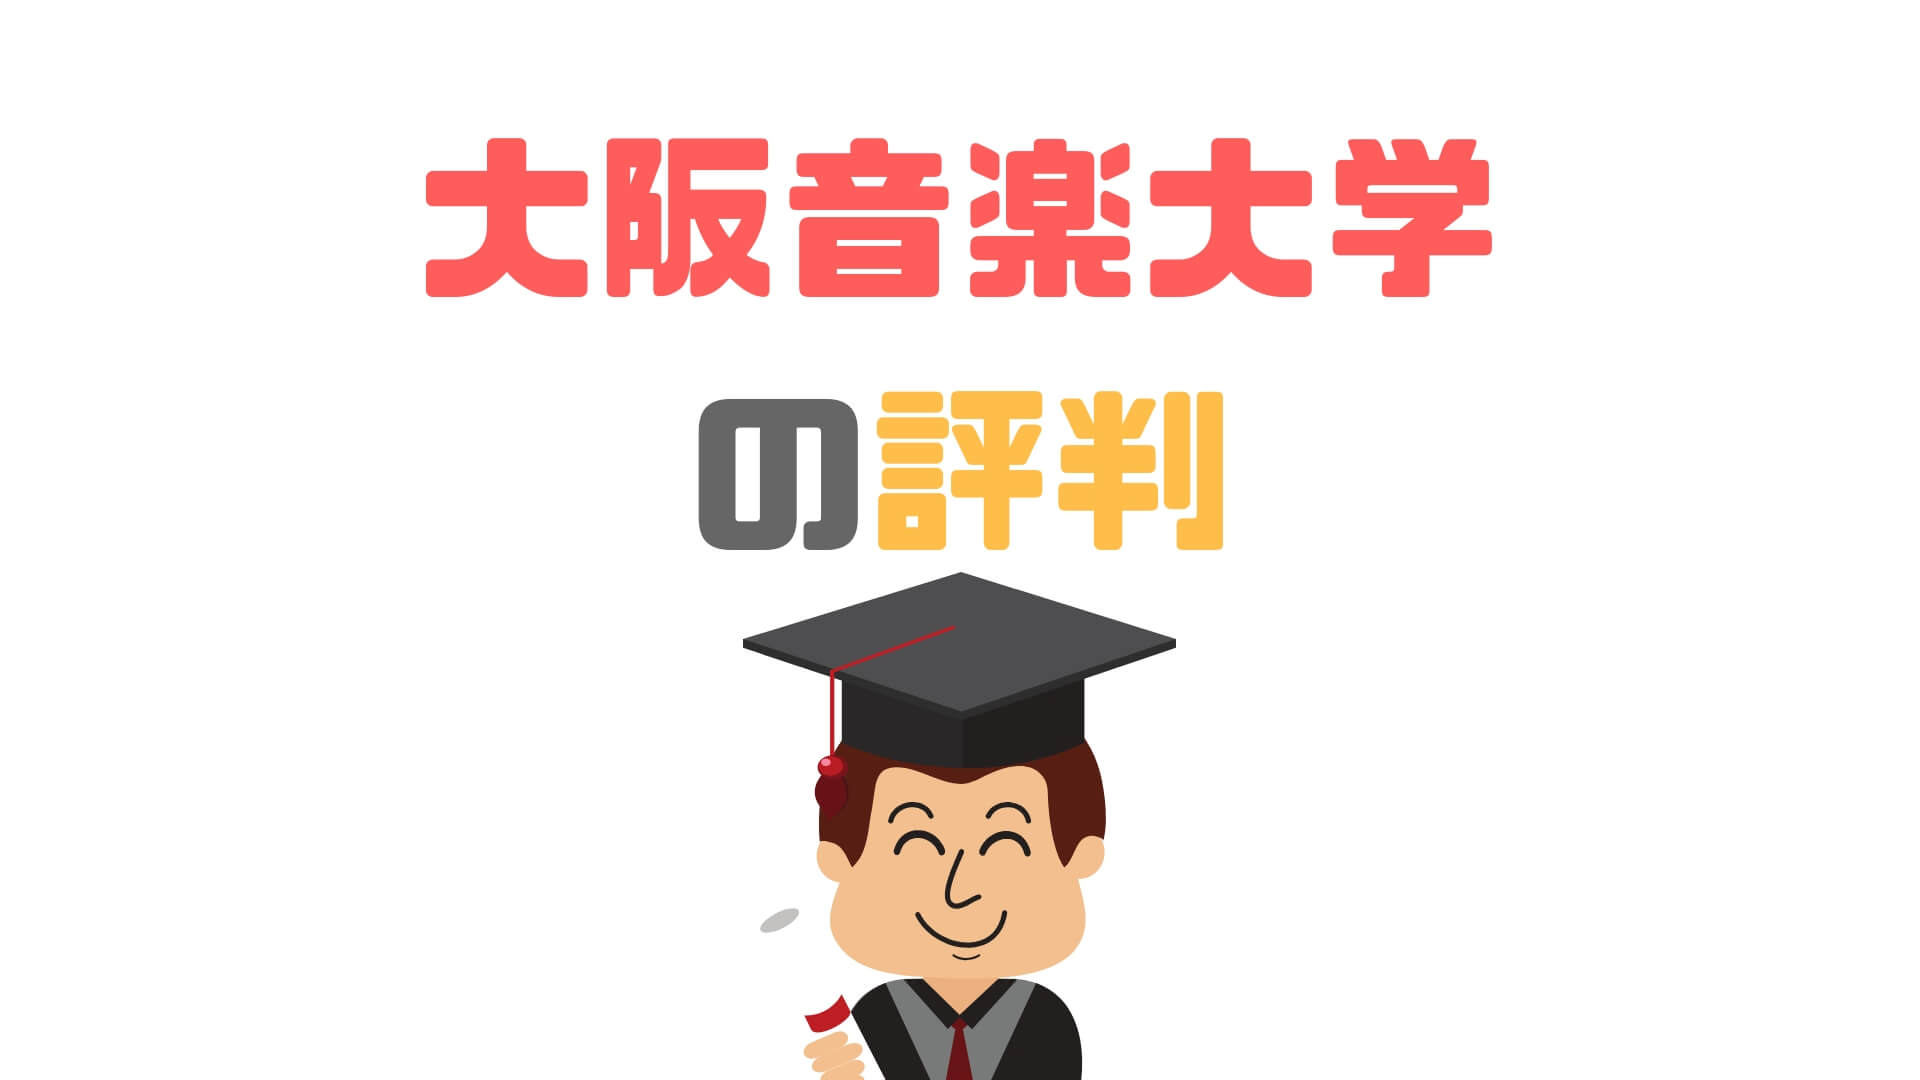 大阪音楽大学の評判